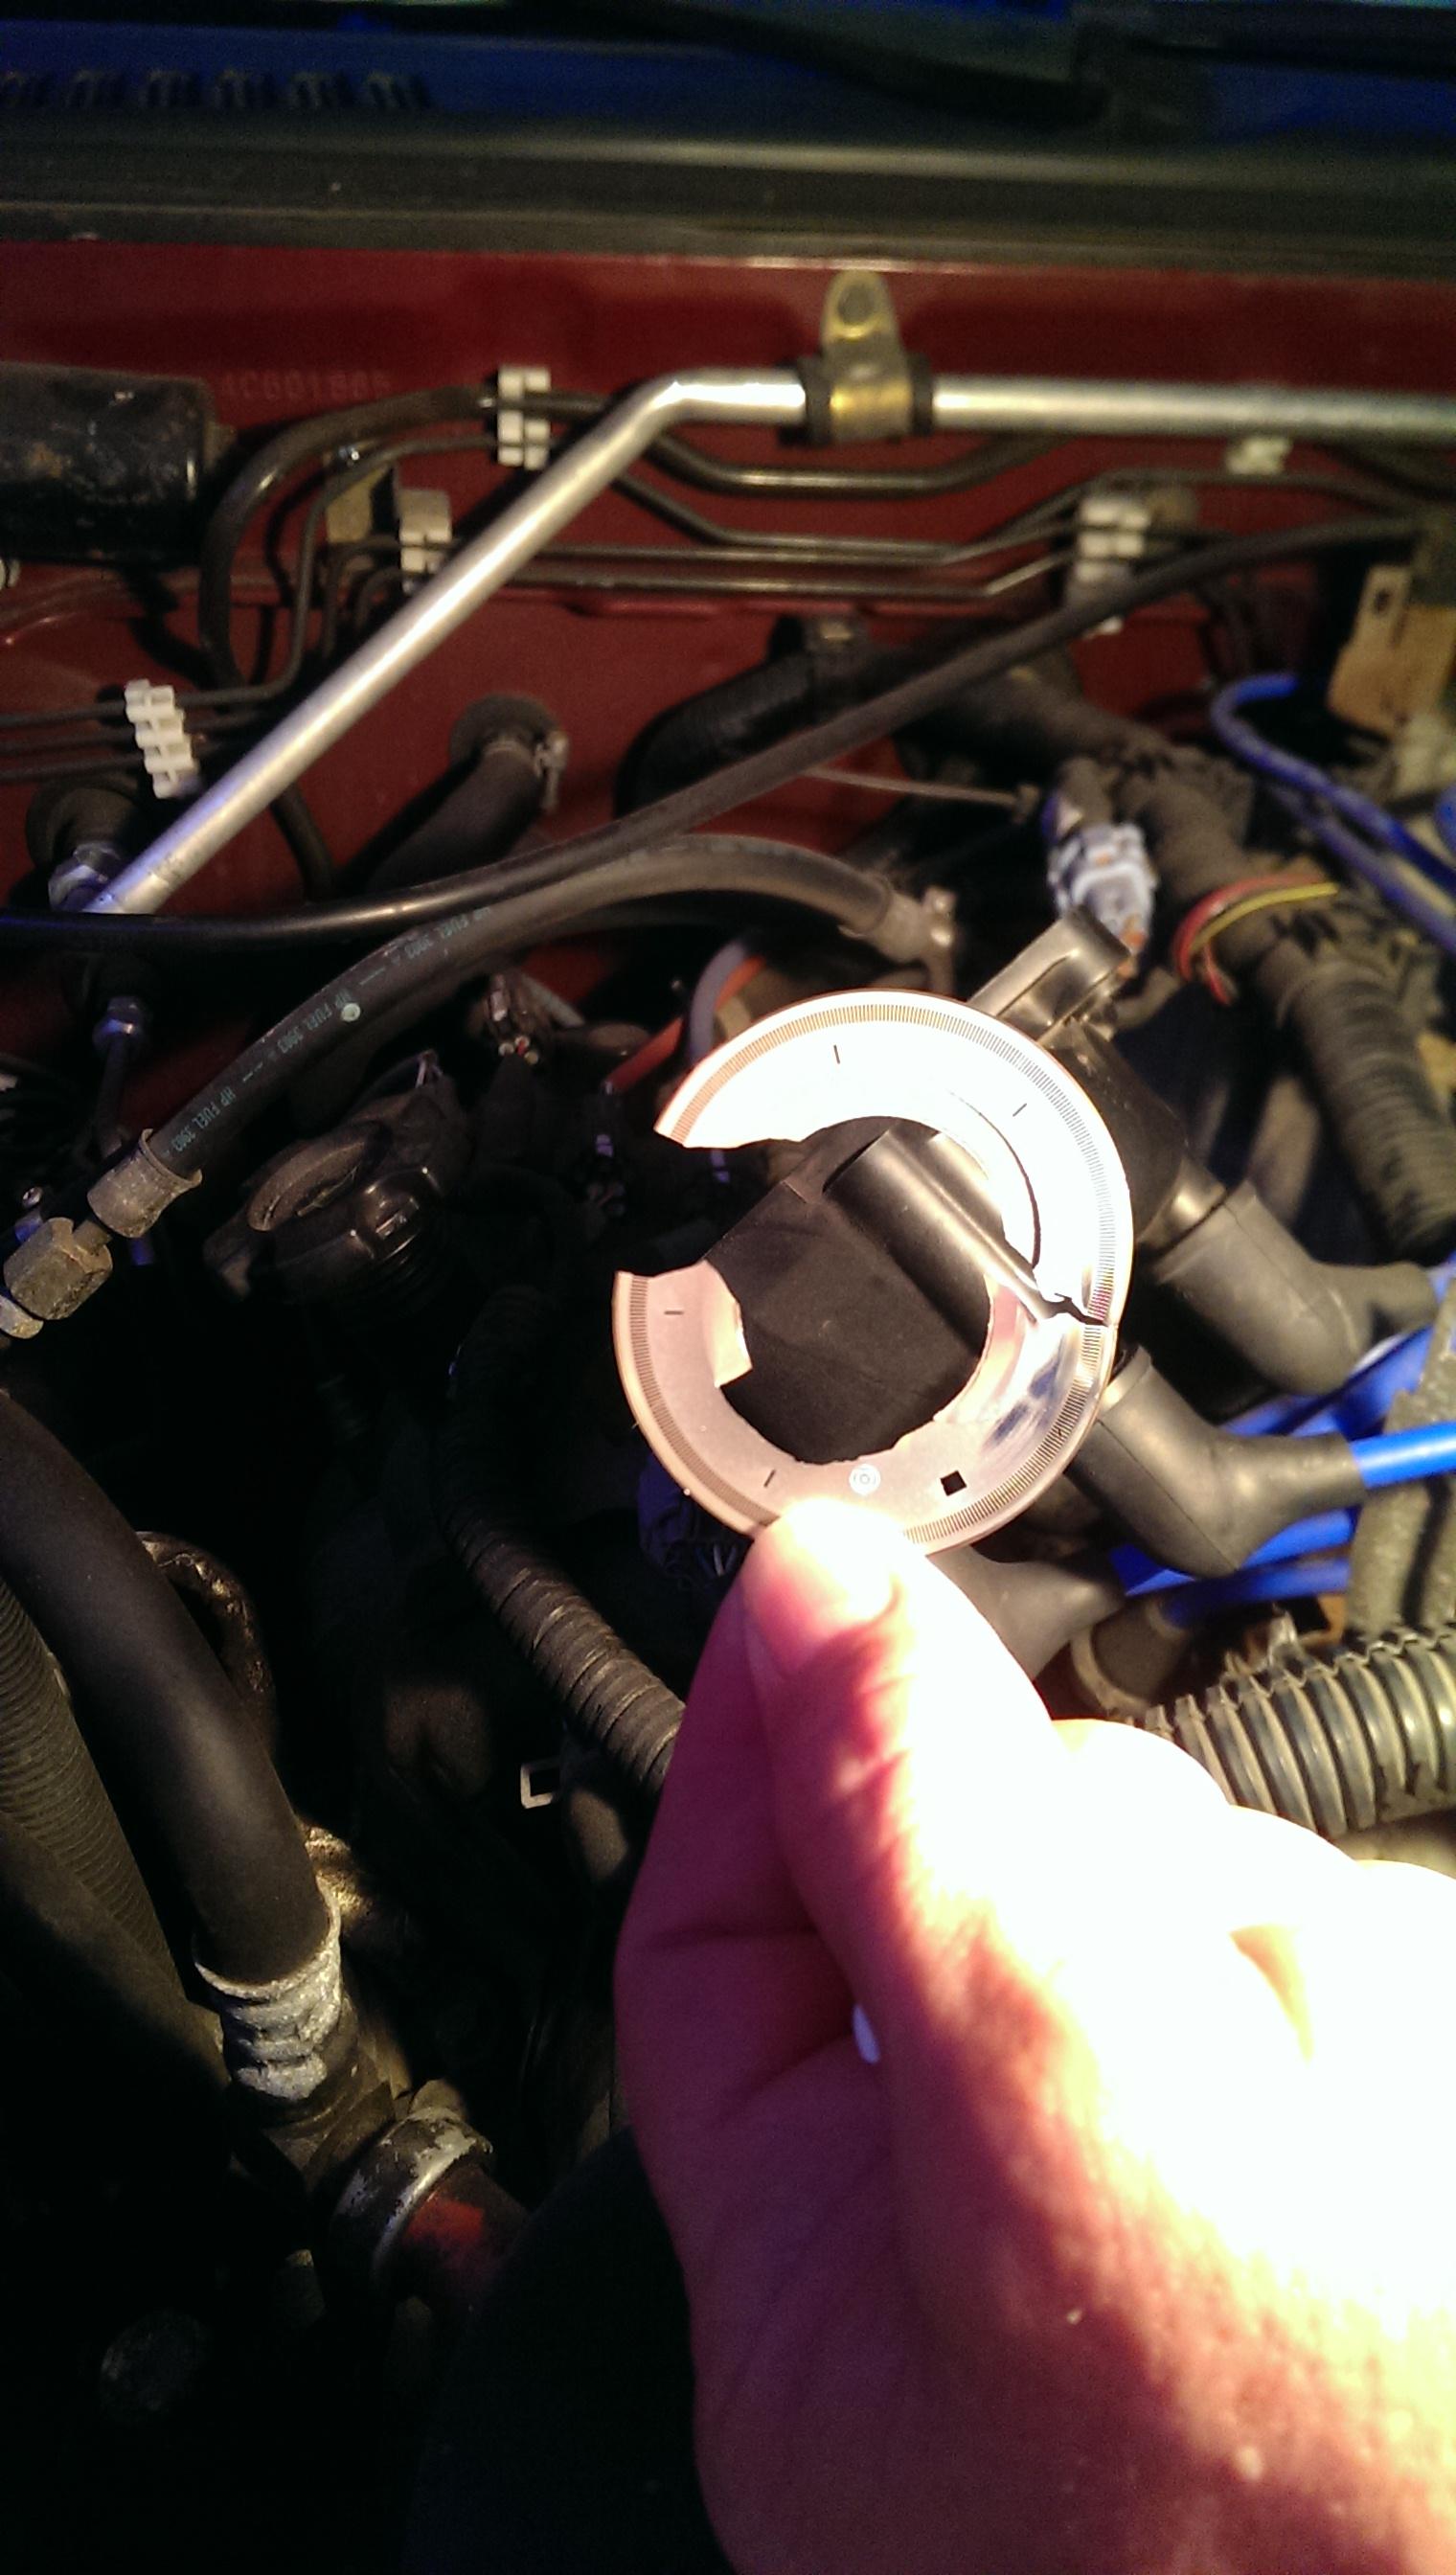 2004 VG33E Non S/C Engine Stopped | Nissan XTerra Forum